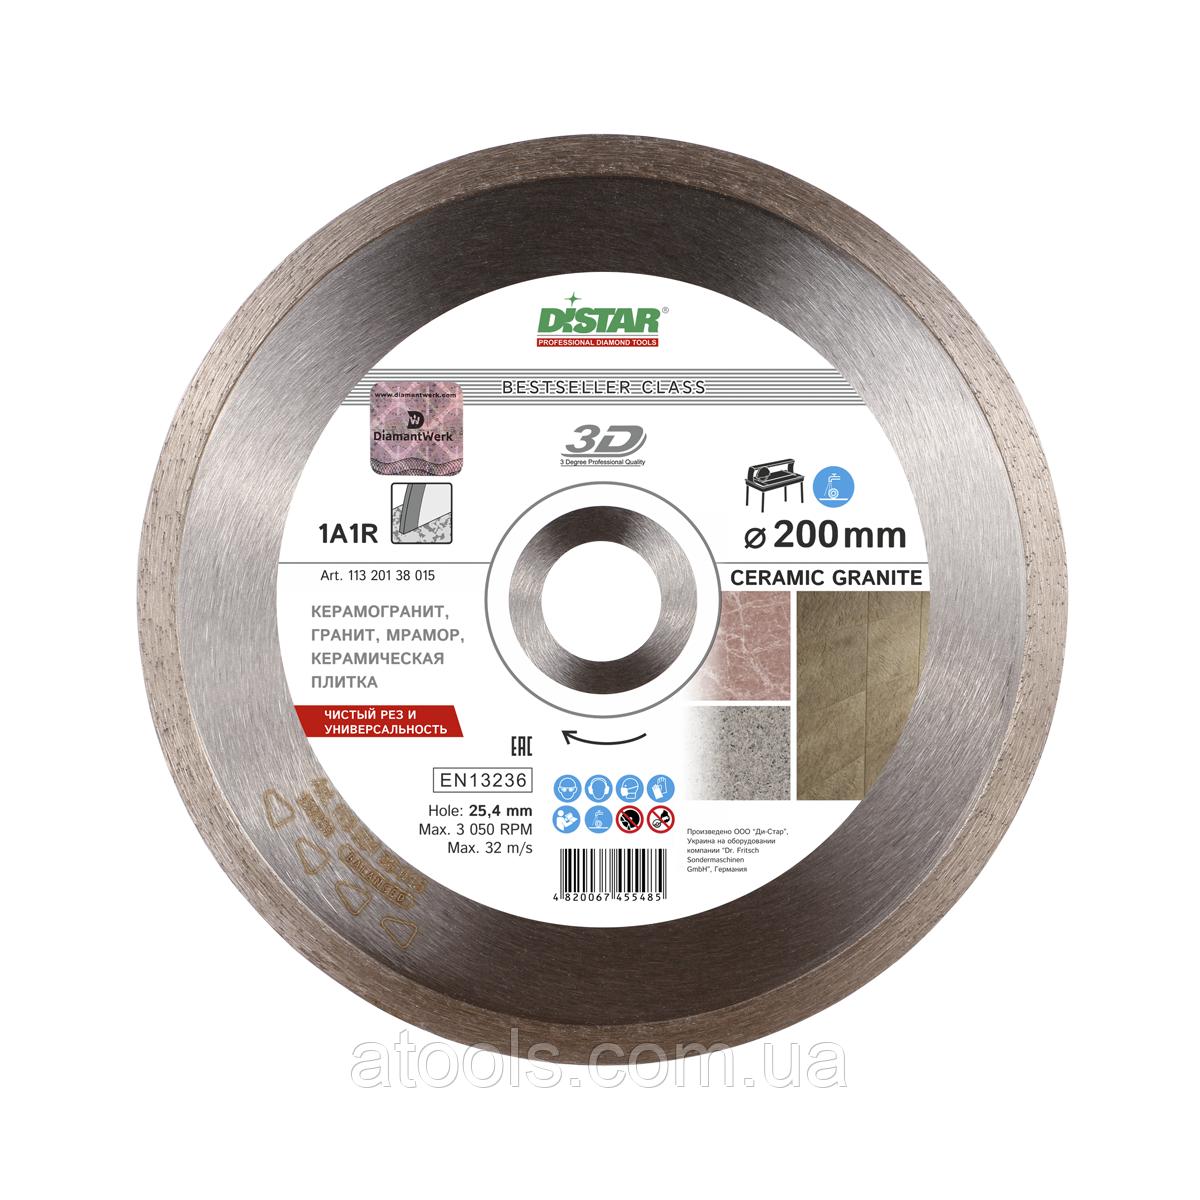 Алмазный отрезной диск Distar Ceramic Granite 1A1R 250x1.7x10x25.4 Bestseller (11320138019)